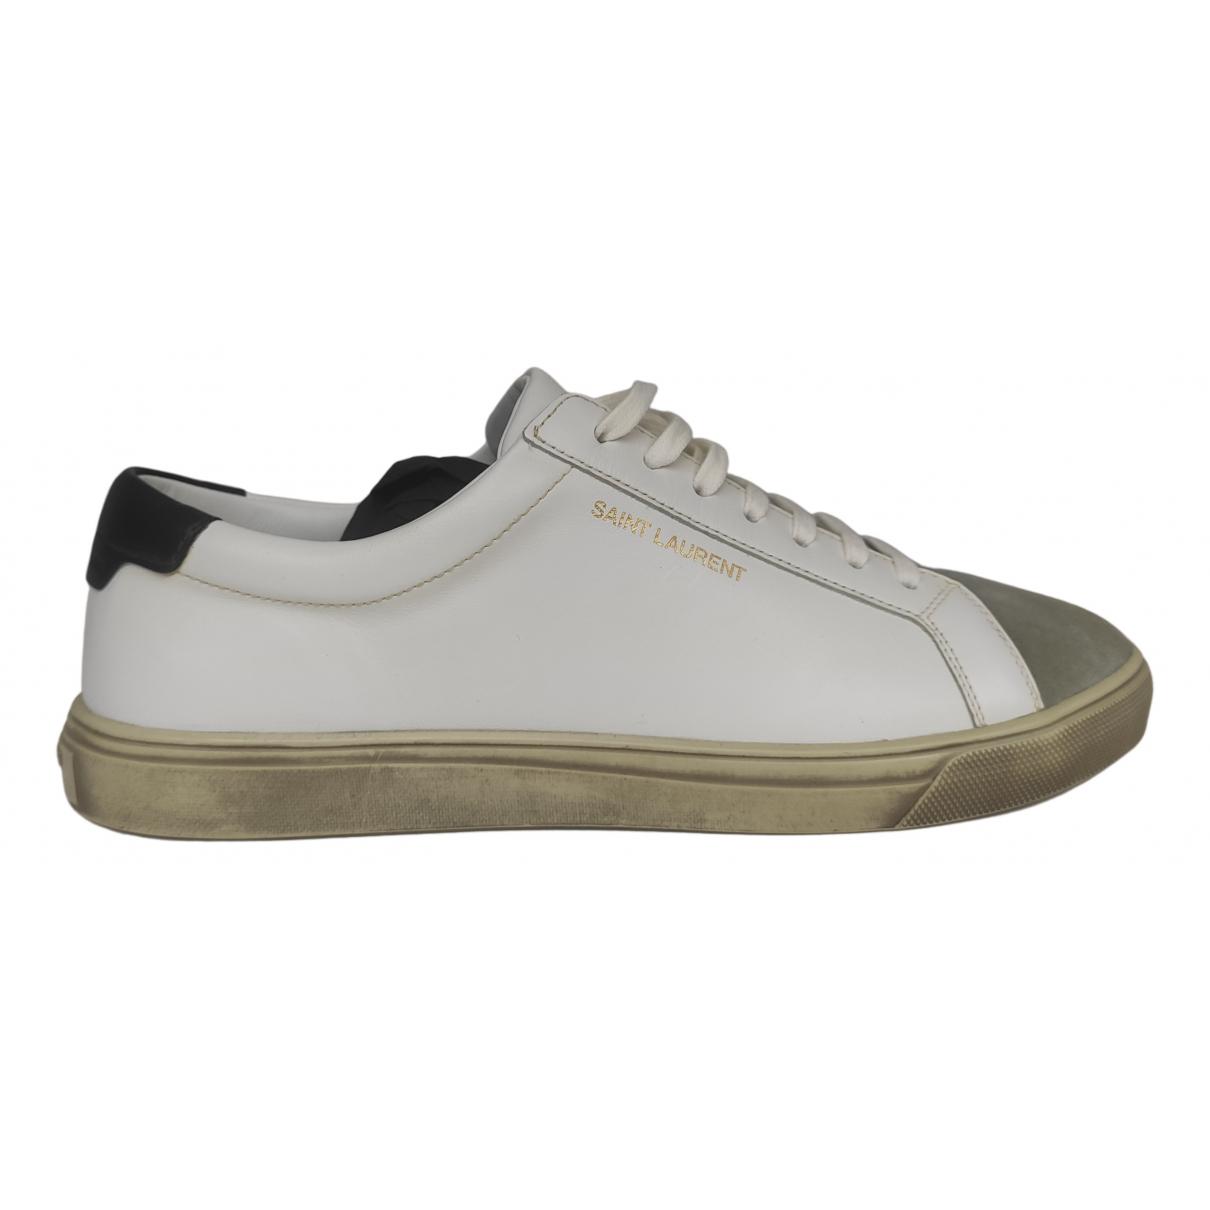 Saint Laurent SL/01 Sneakers in  Weiss Leder